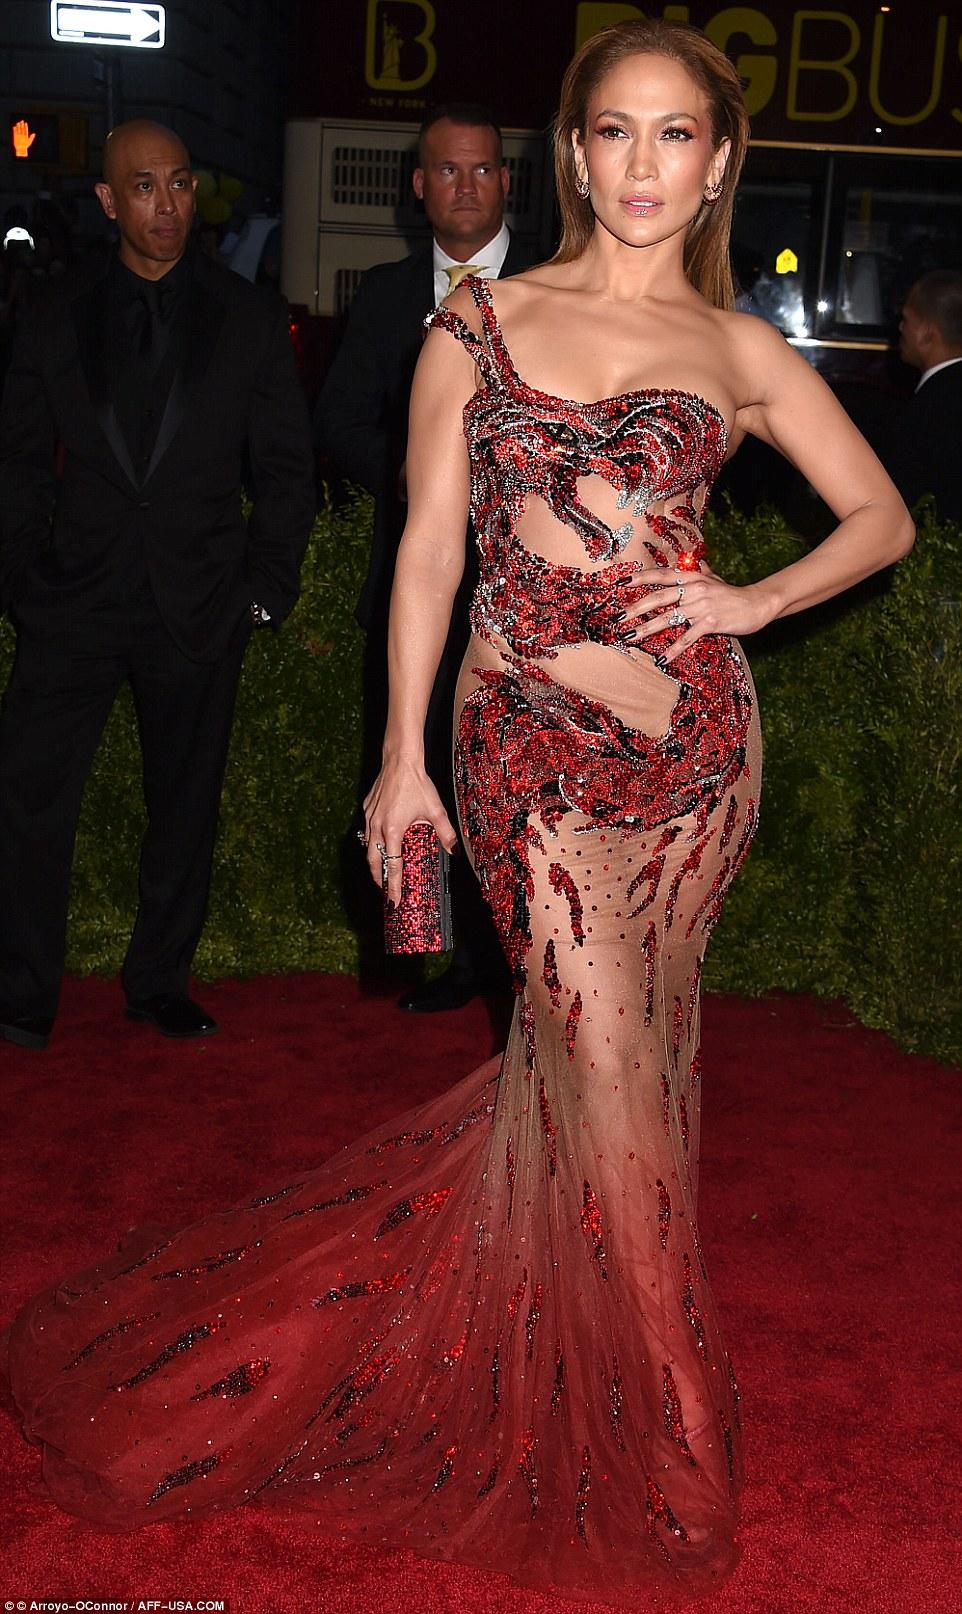 Jennifer Lopez at Red Carpet